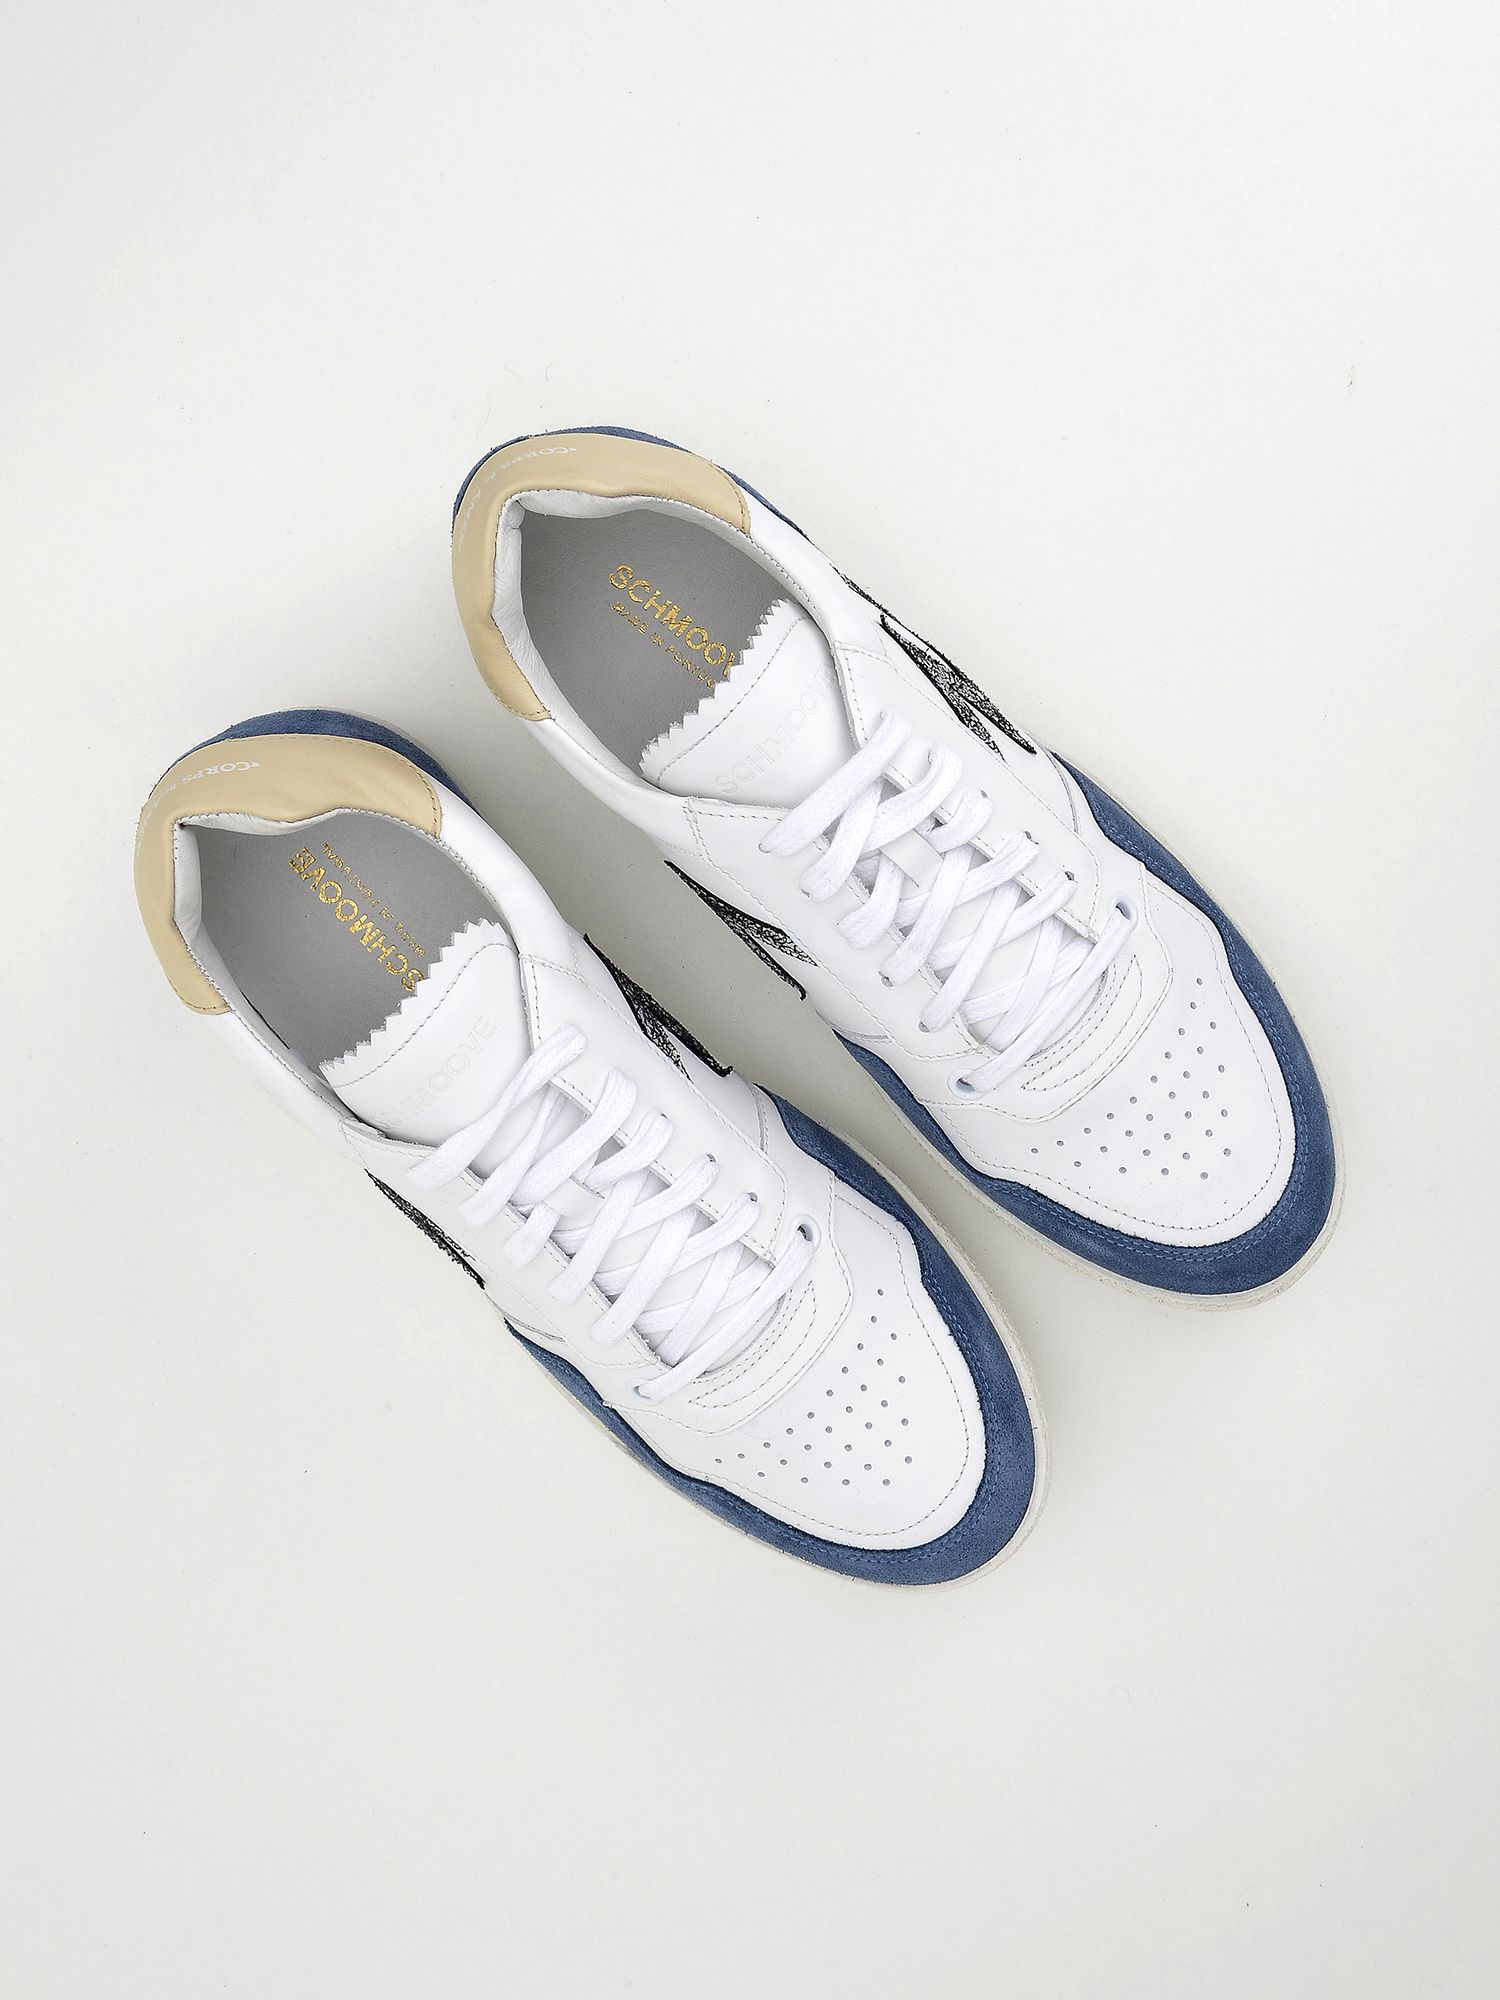 schmoove.fr Squash Tennis M - Suede/Nappa - Jeans/White